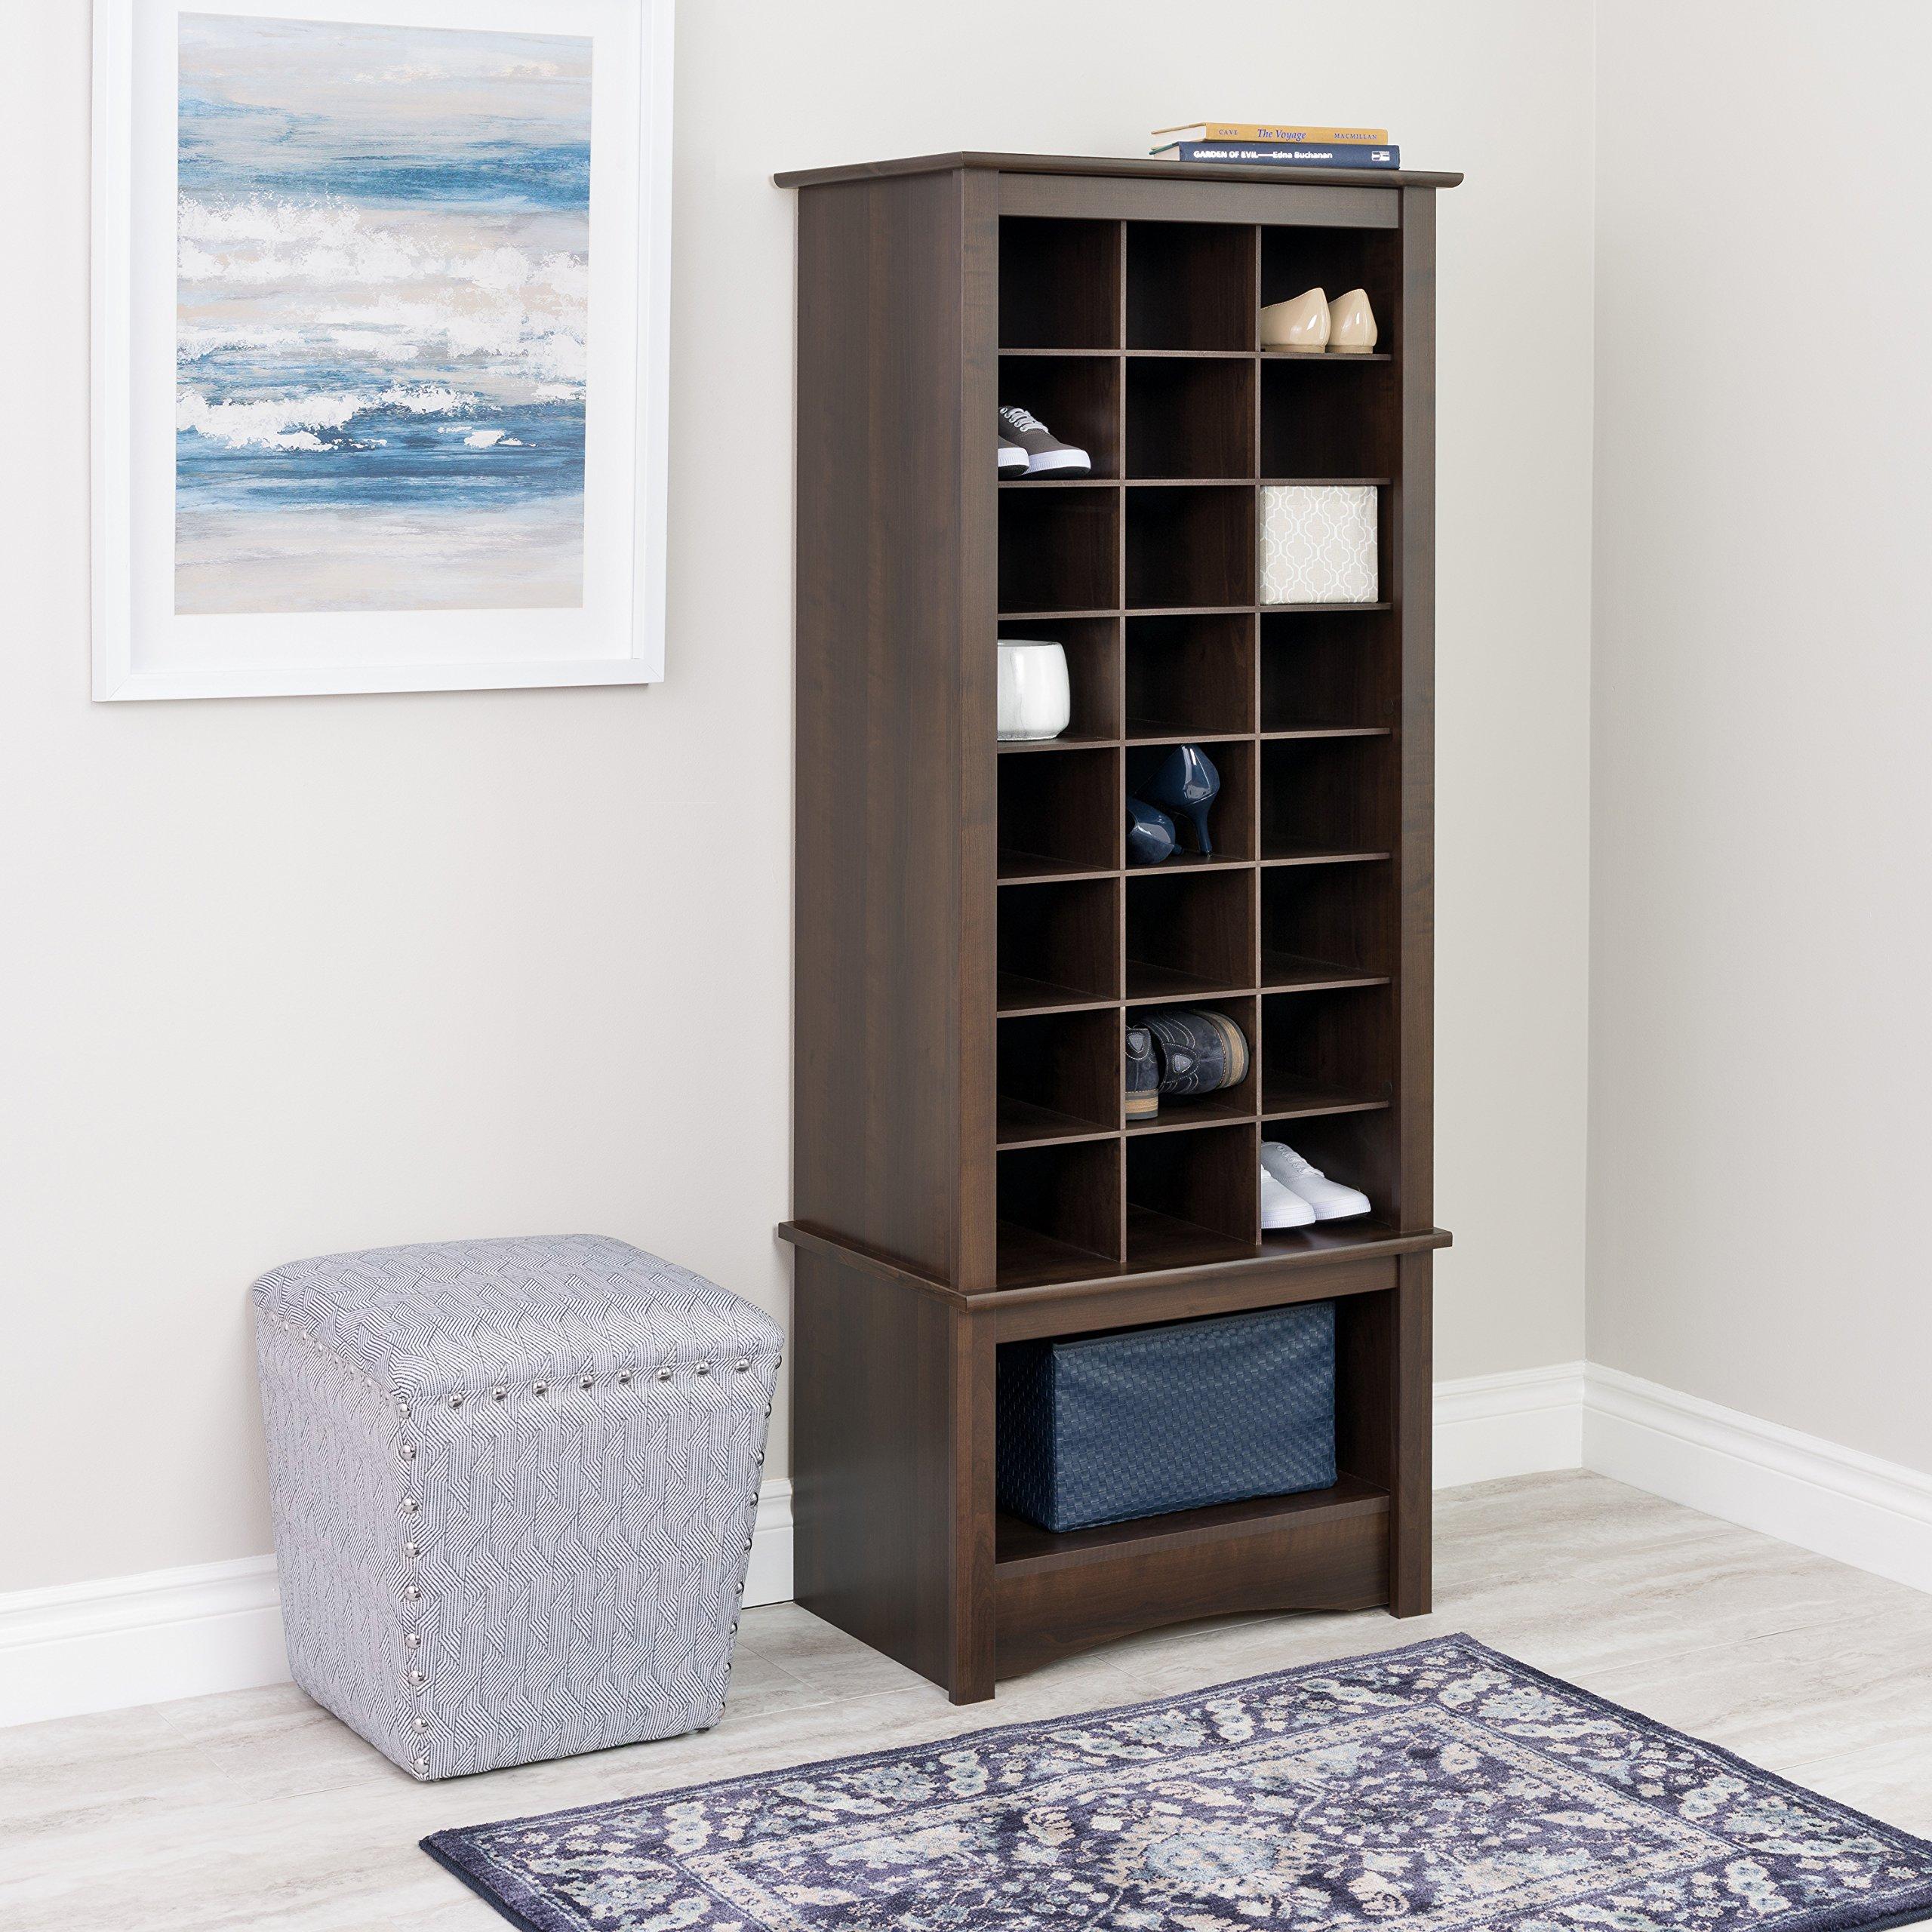 Espresso Tall Shoe Cubbie Cabinet by Prepac (Image #3)